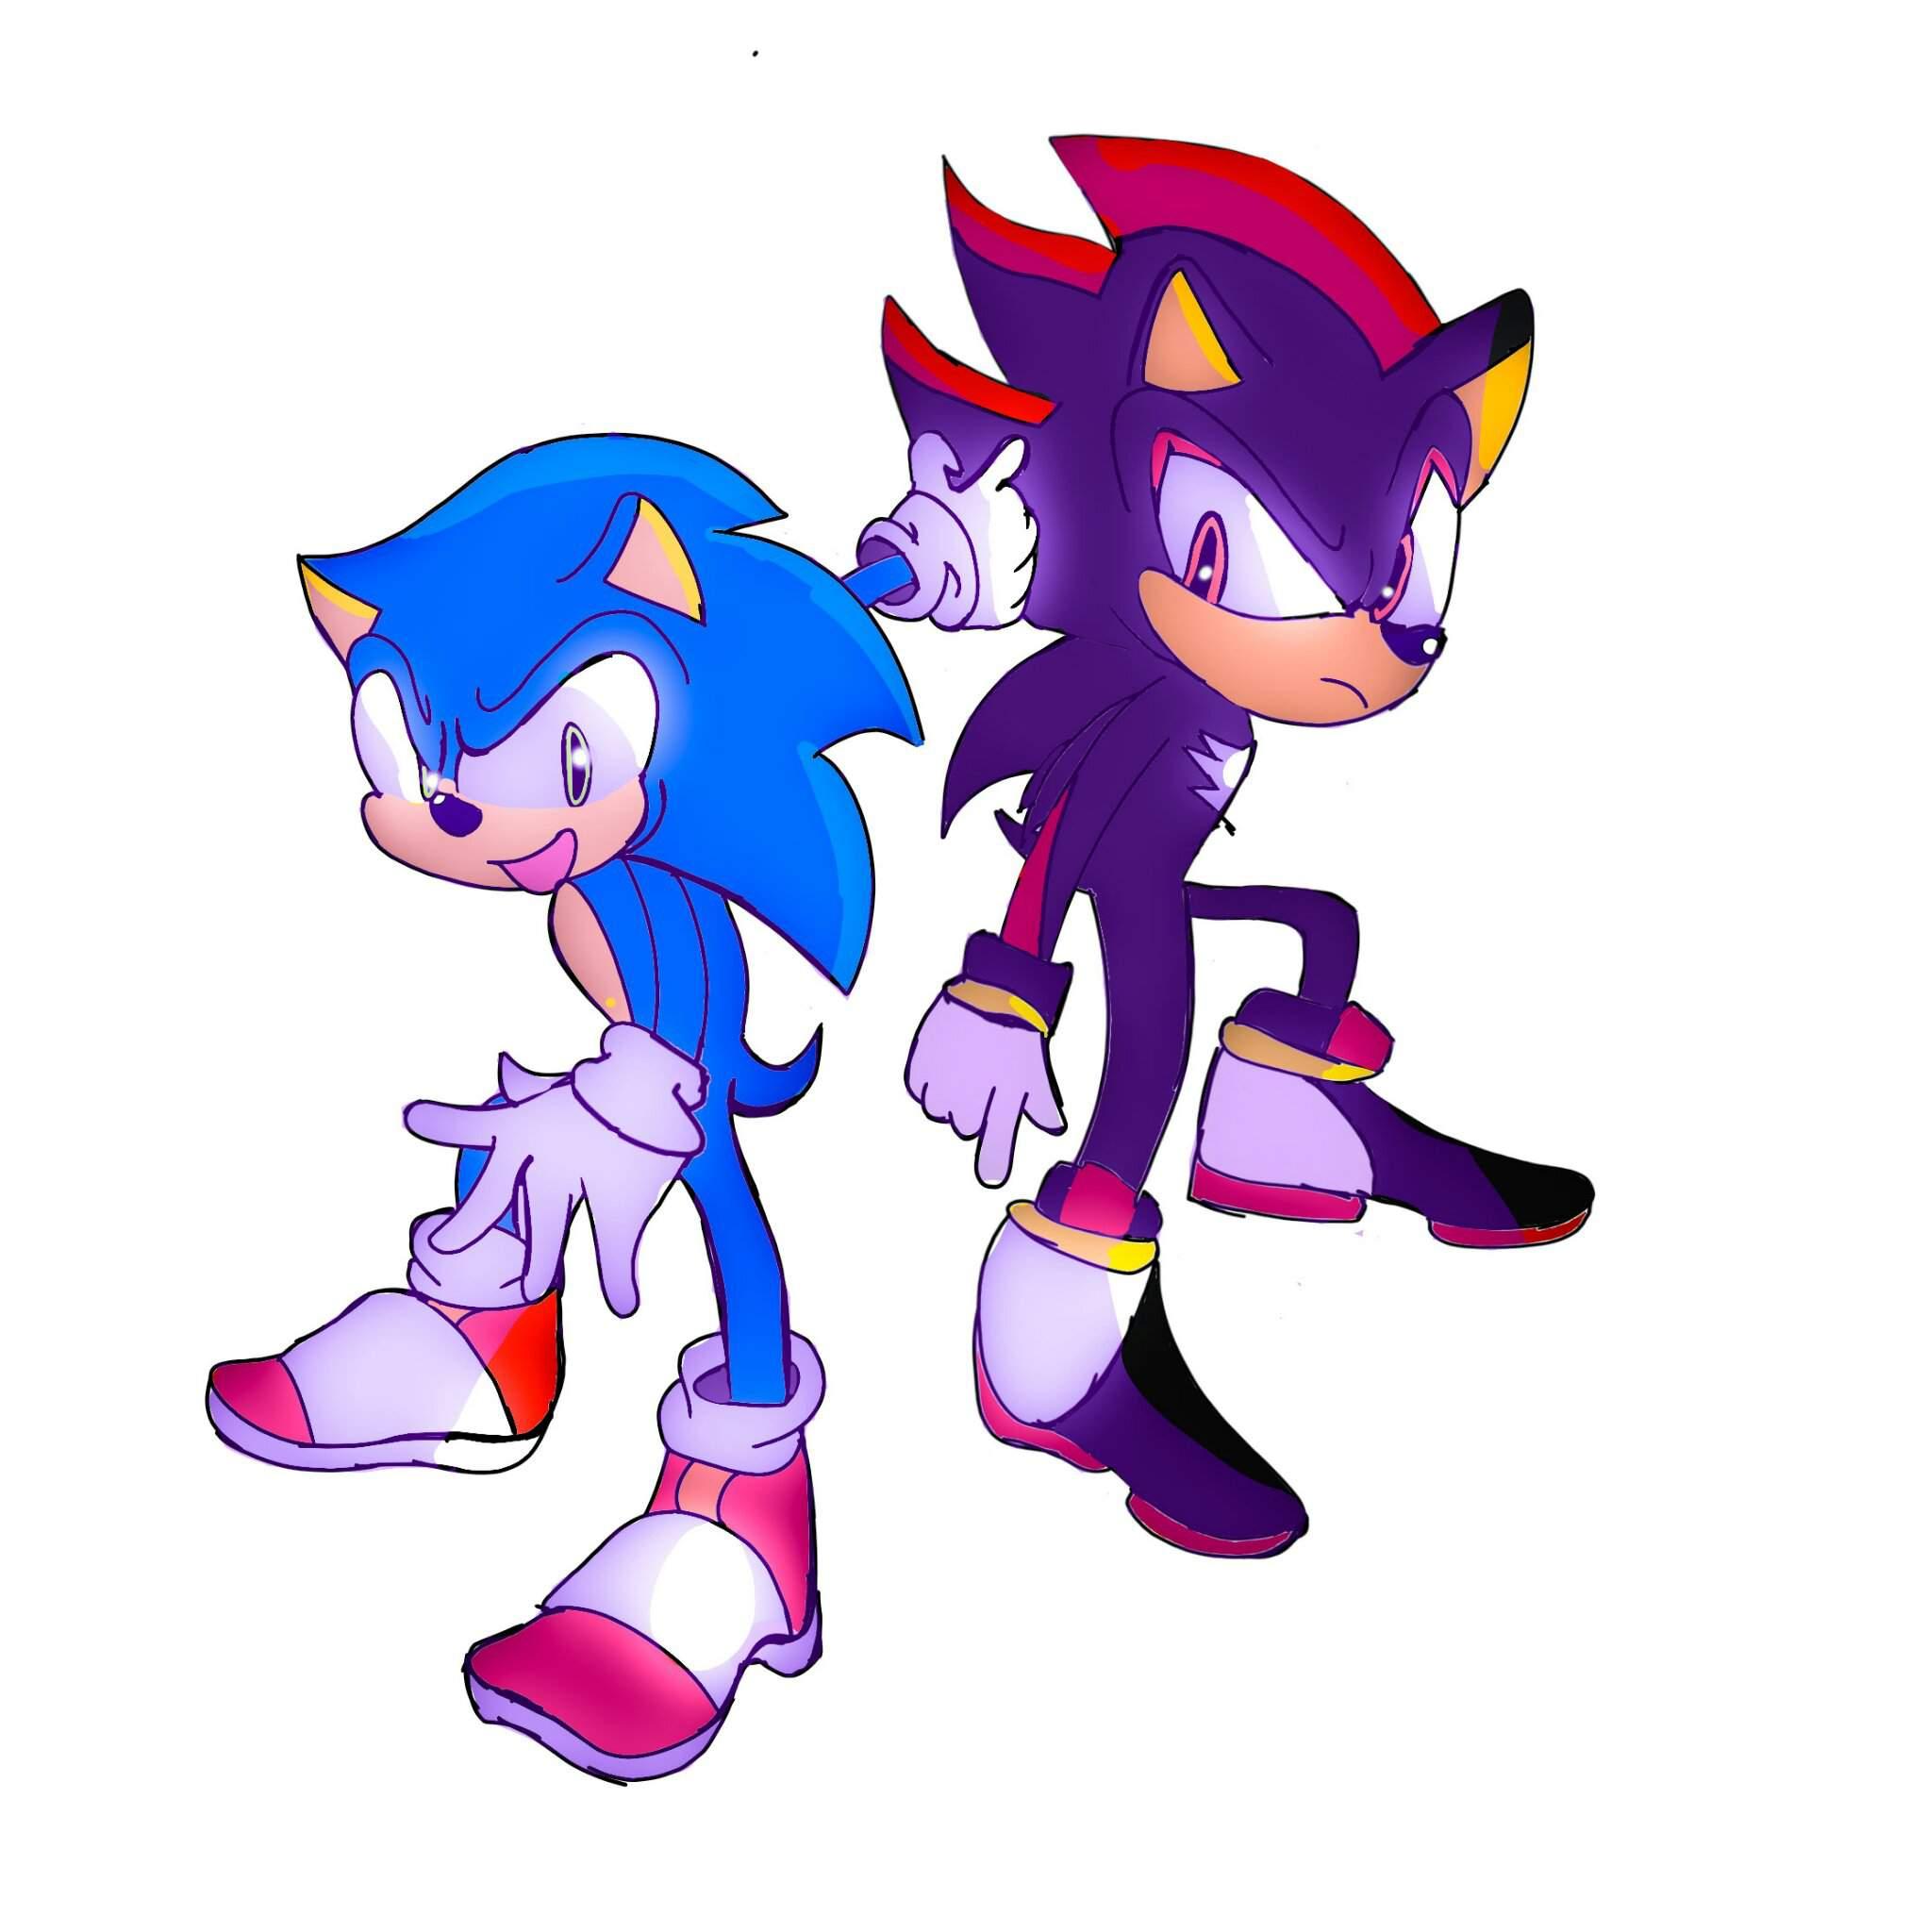 Sonic Adventure 2 Poses Sonic The Hedgehog Amino